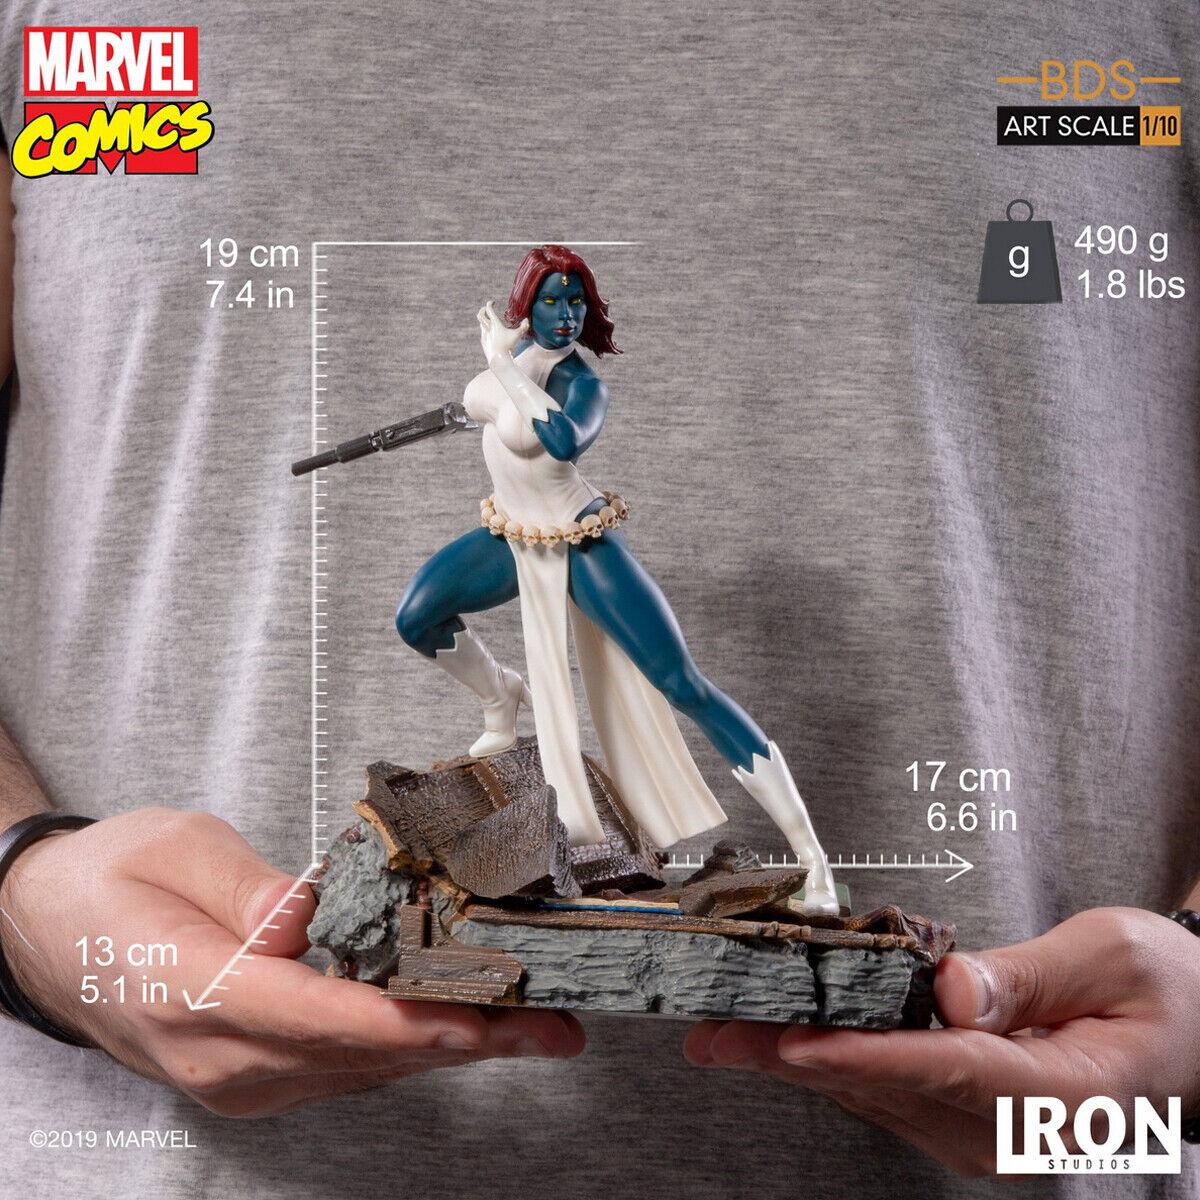 Iron Studios MARCAS17019-10 1 10 Scale Marvel Comic X-Man Mystique Statue Model